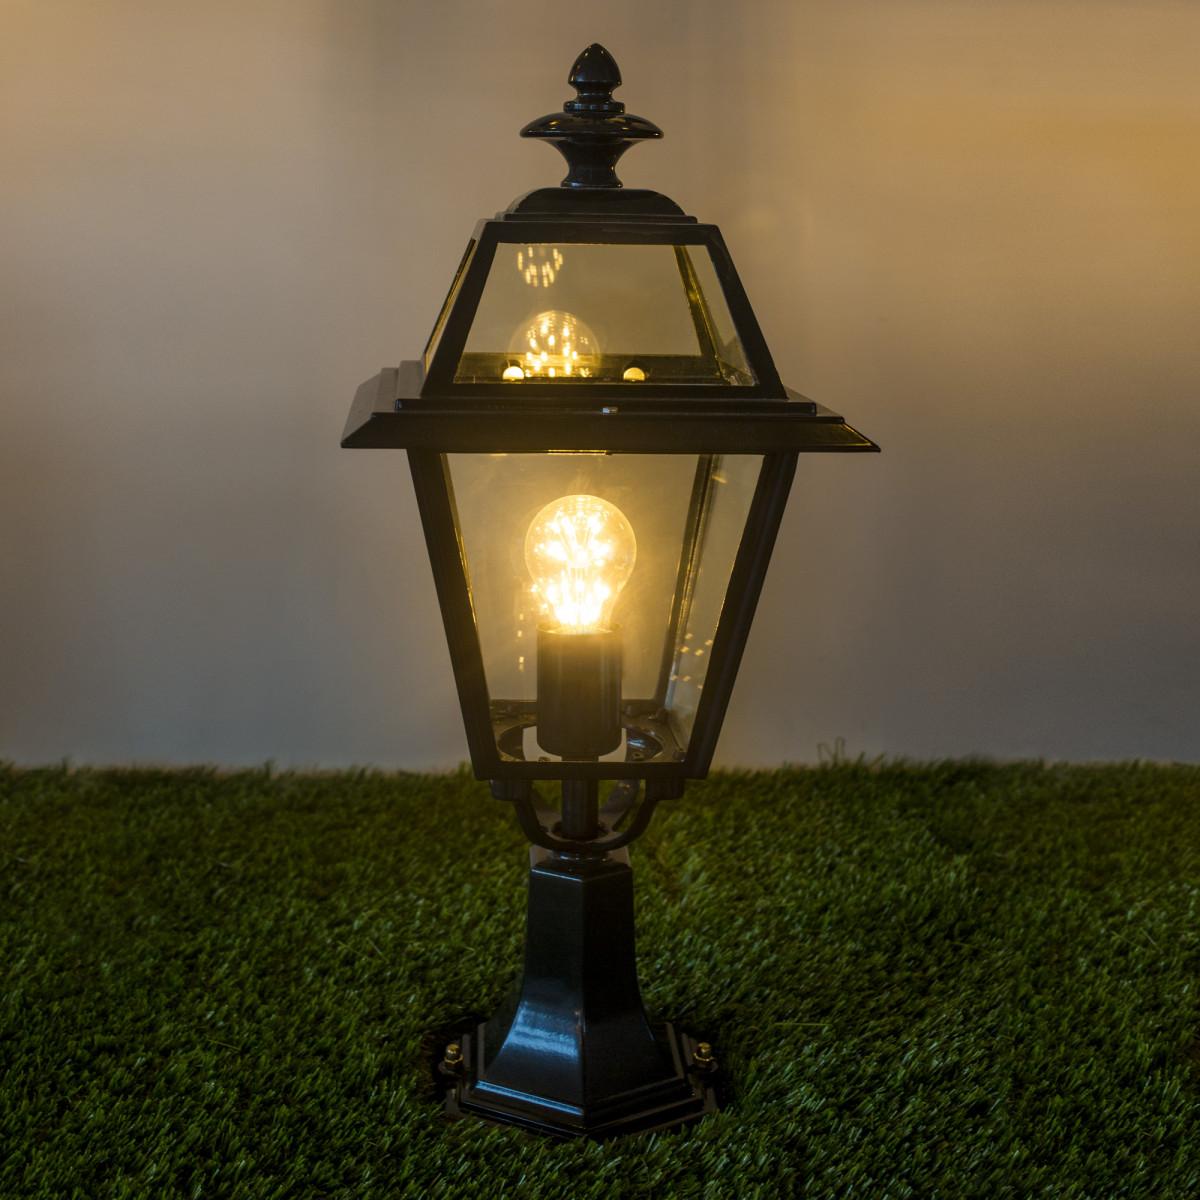 Tuinlamp Brunssum sokkel